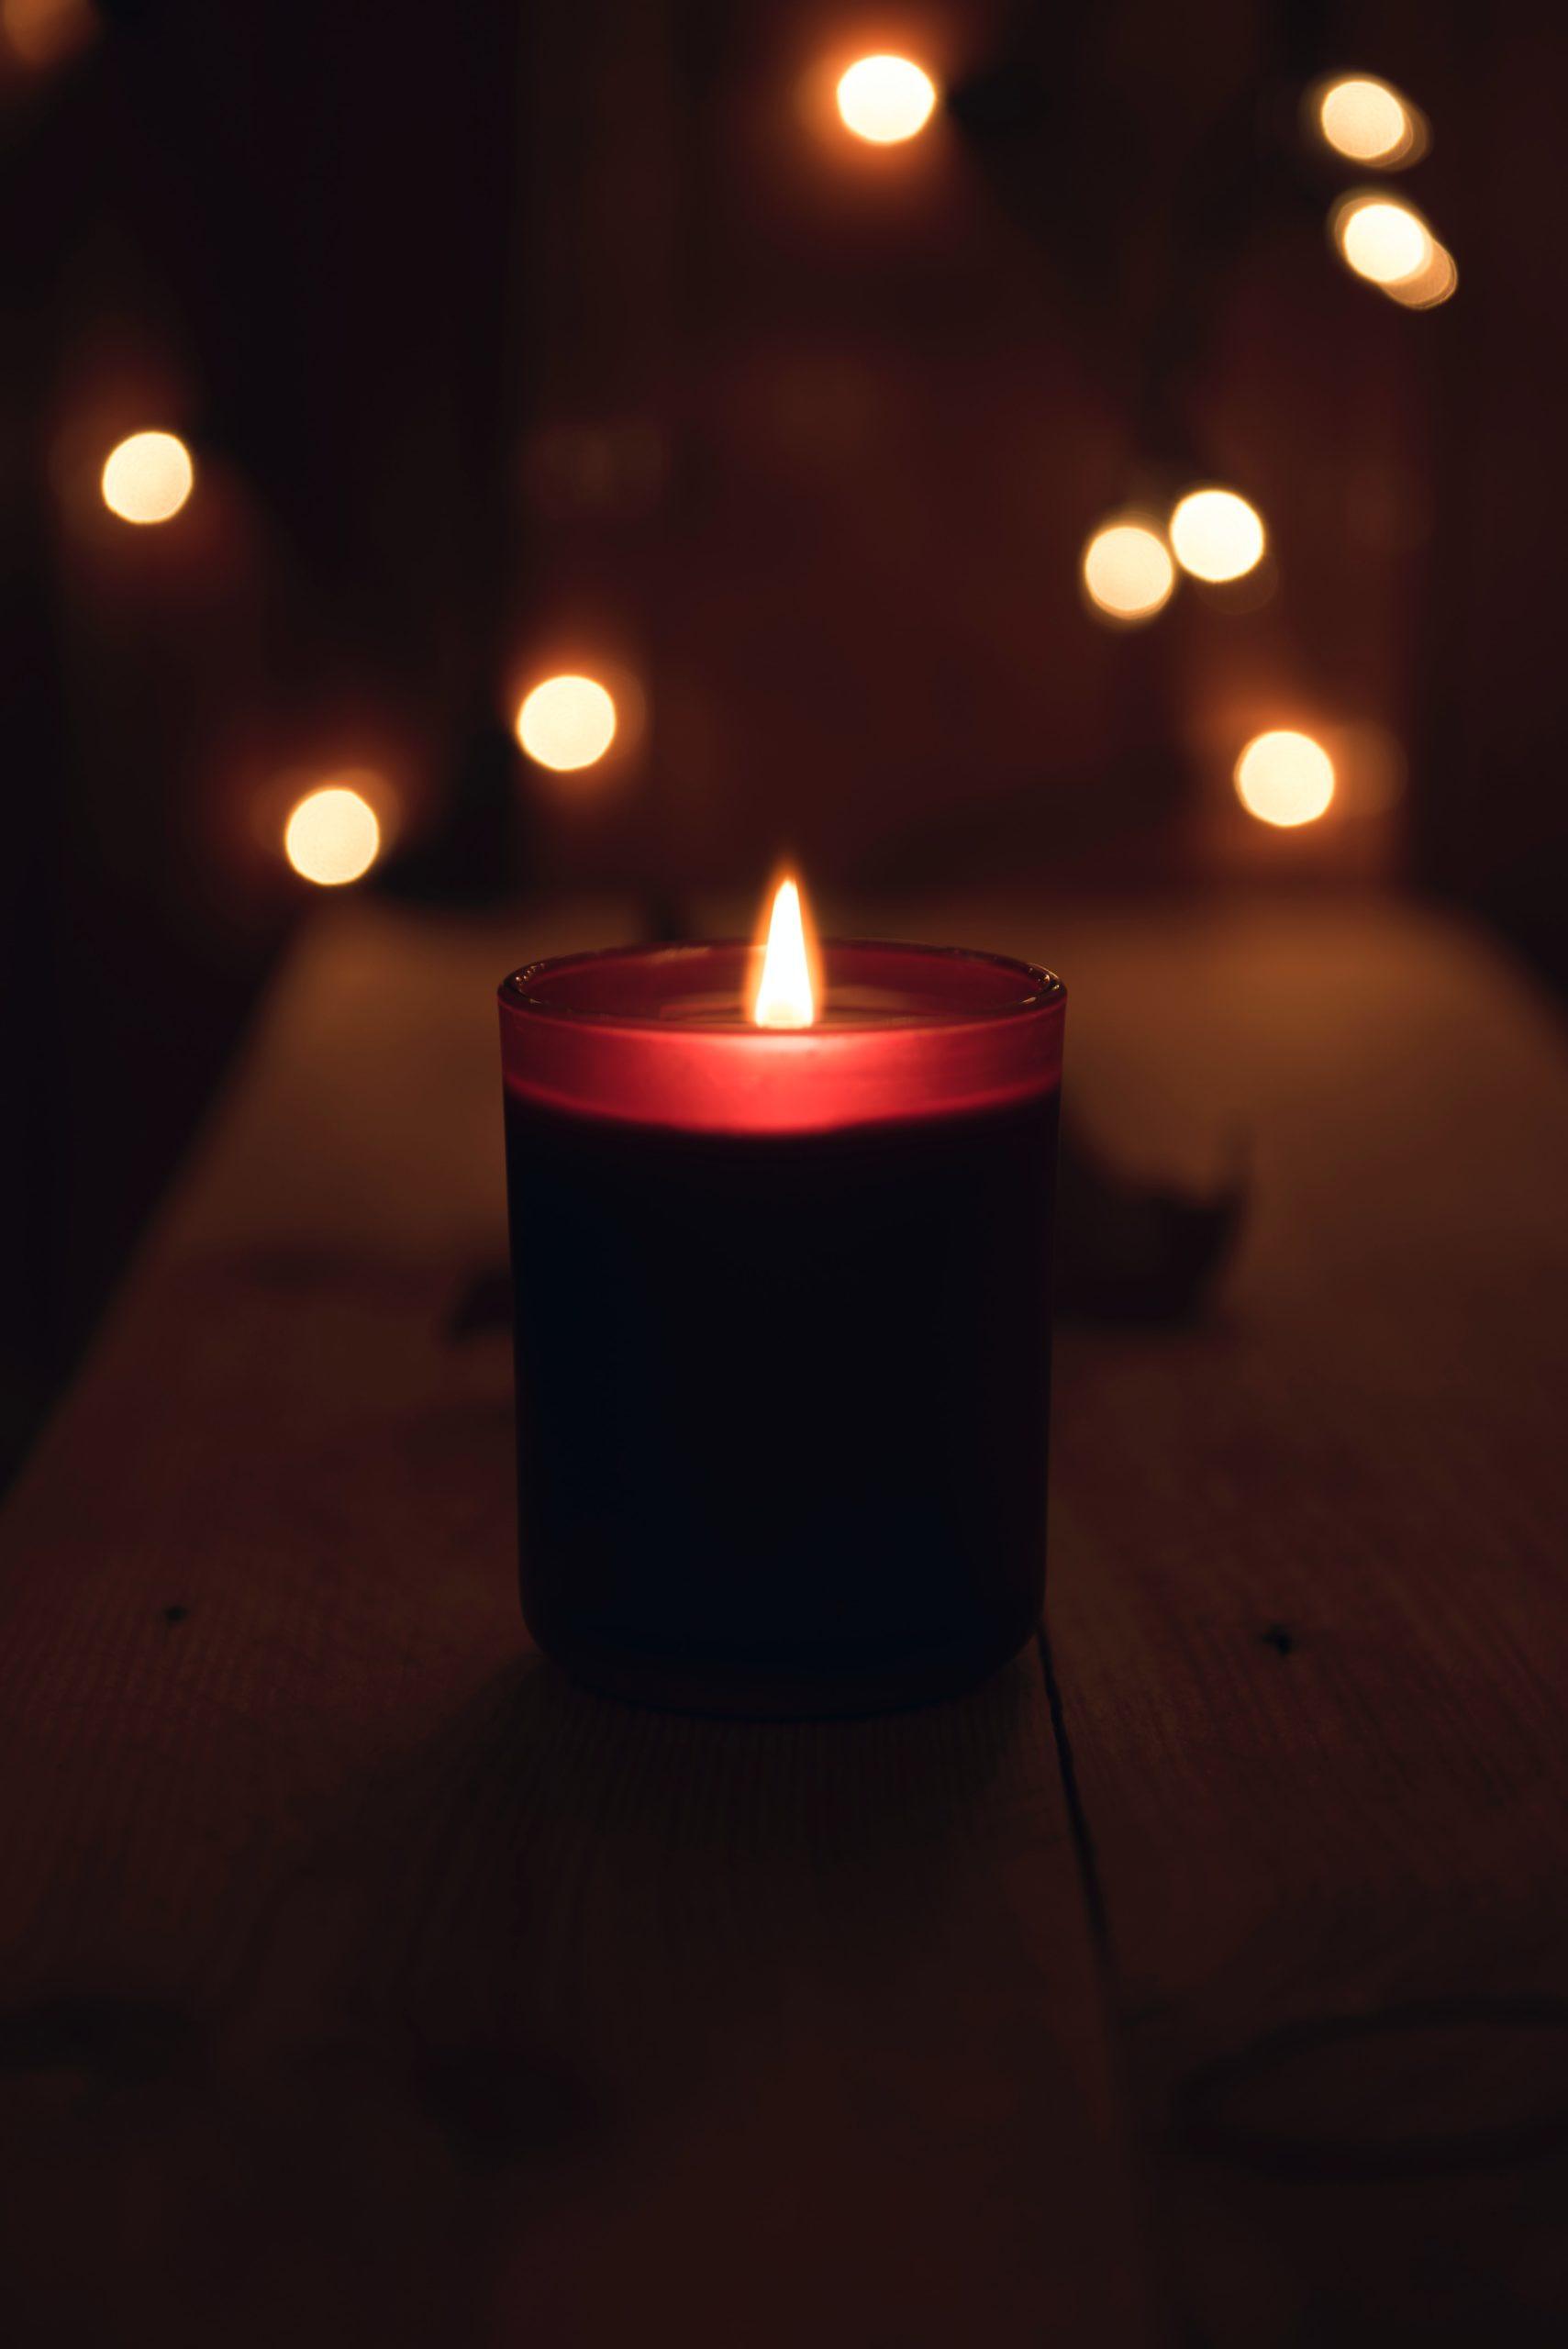 Memorial Candle Lit